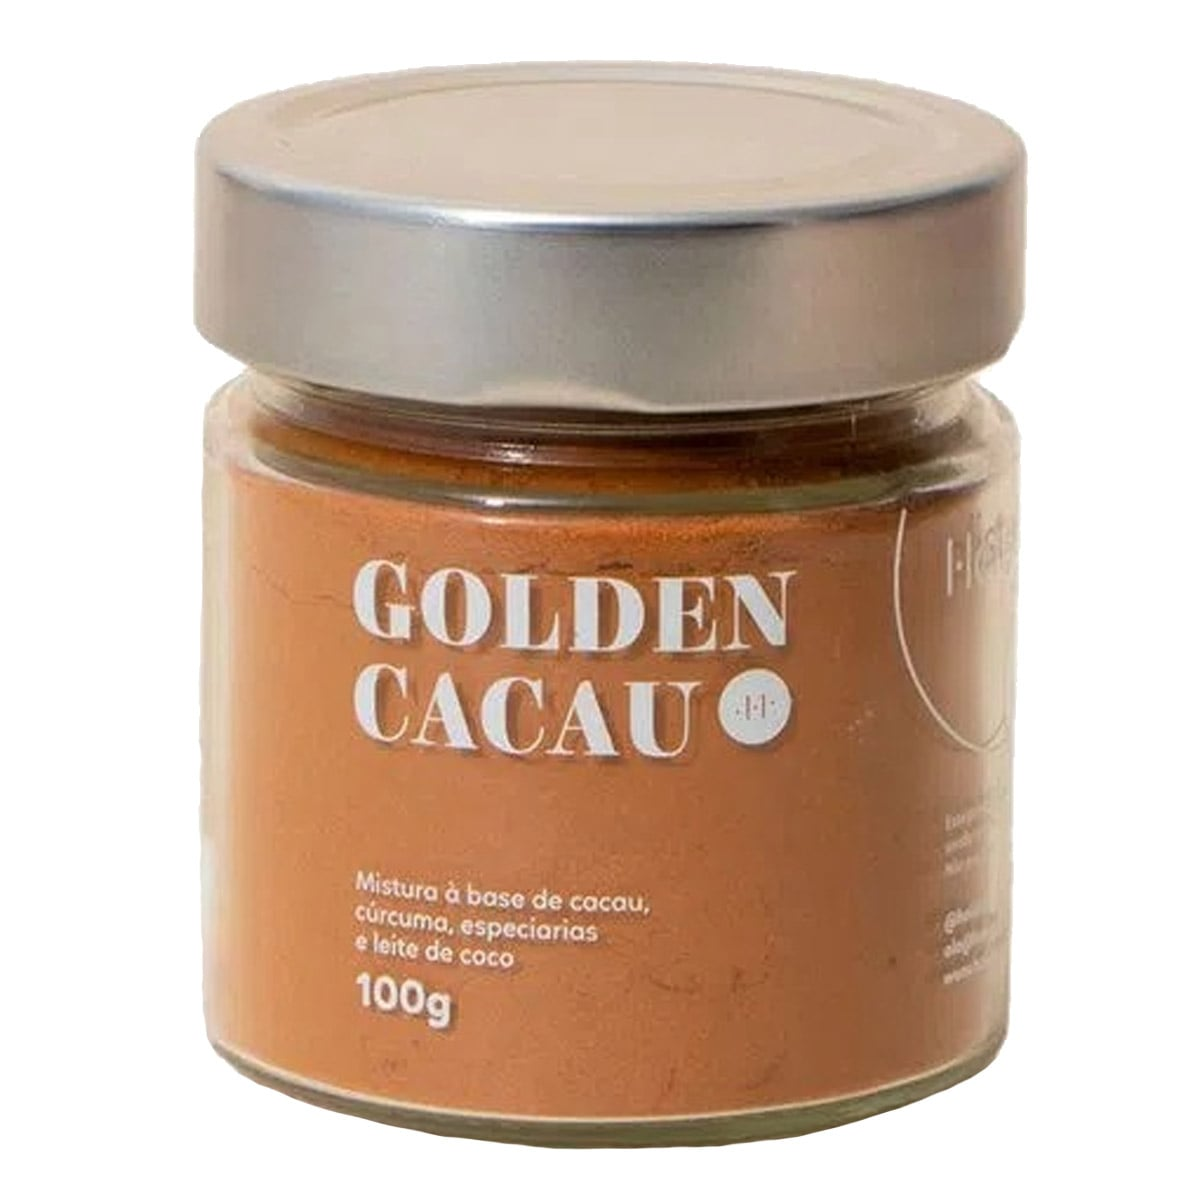 Golden cacau 100g - Holistix